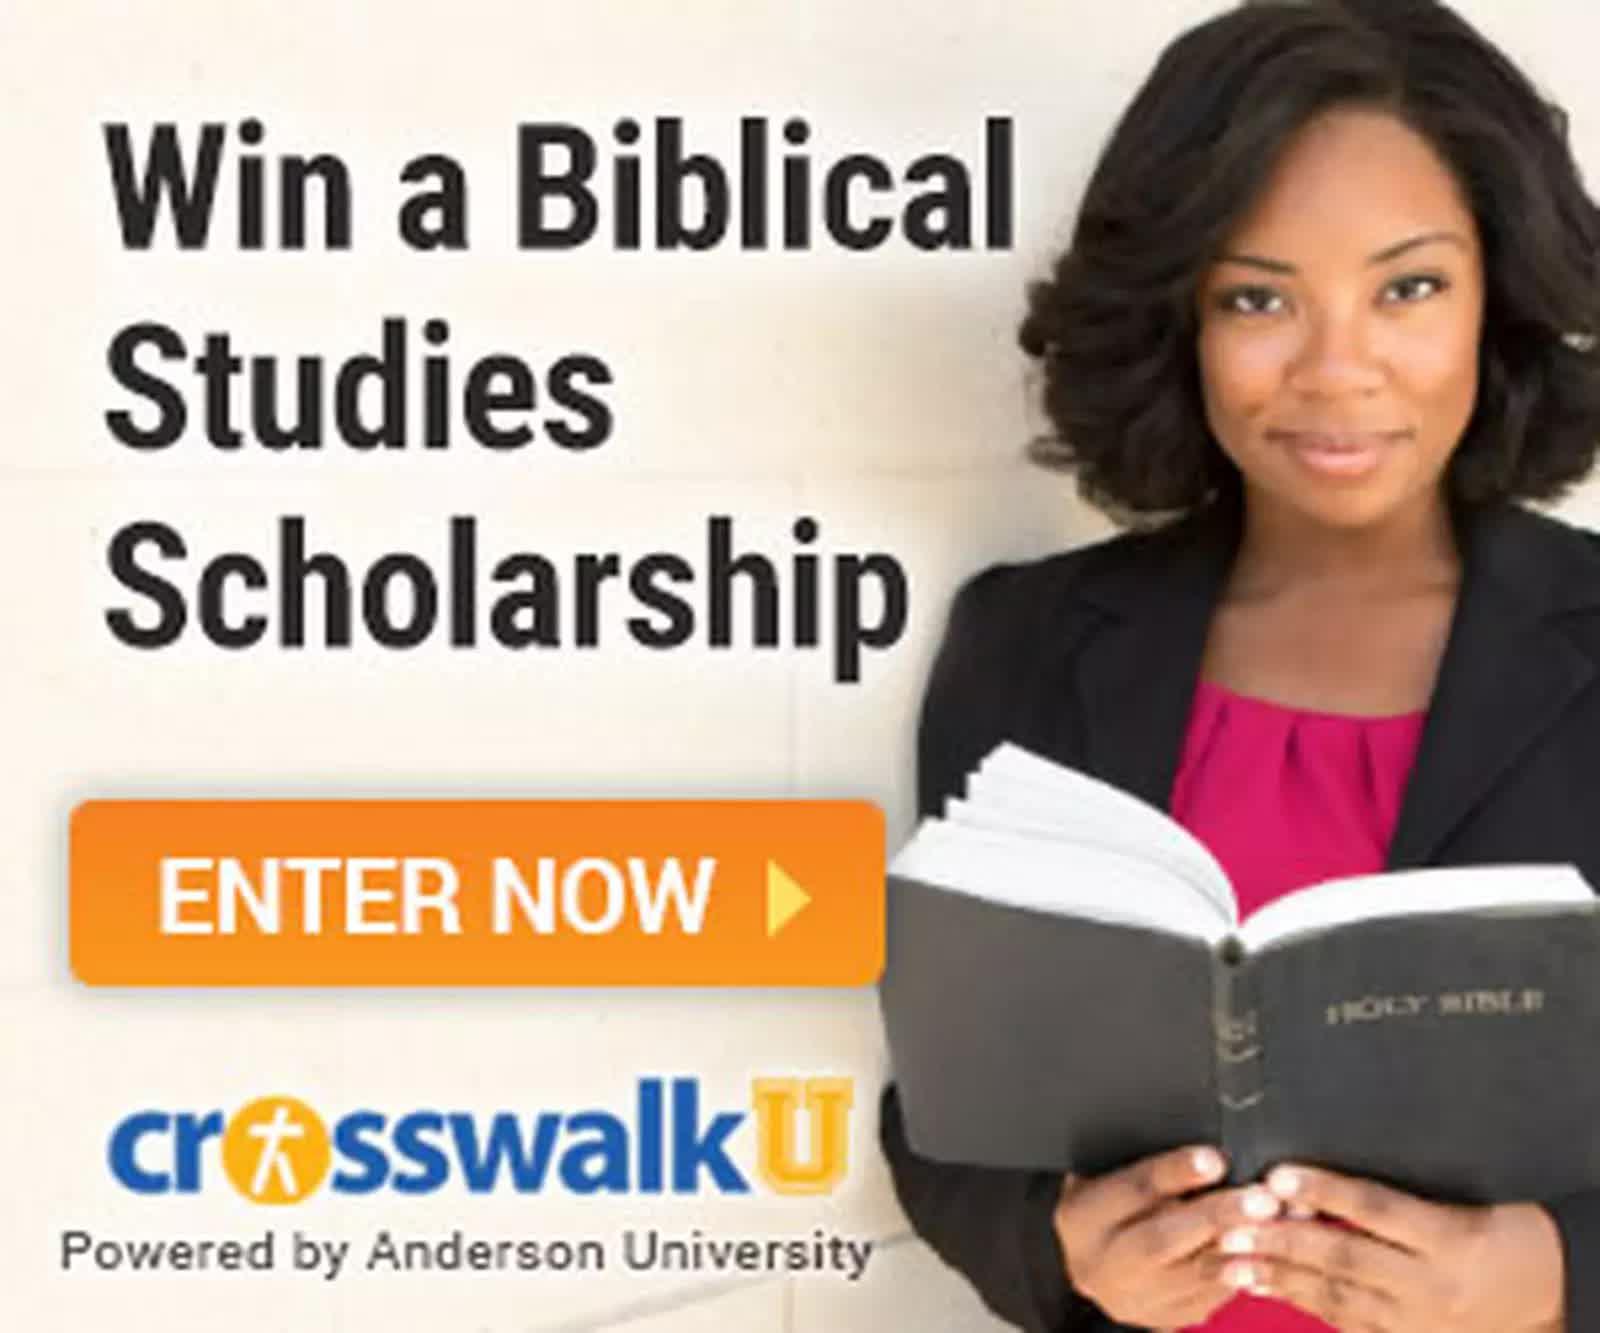 Win a biblical studies scholarship with Crosswalk University